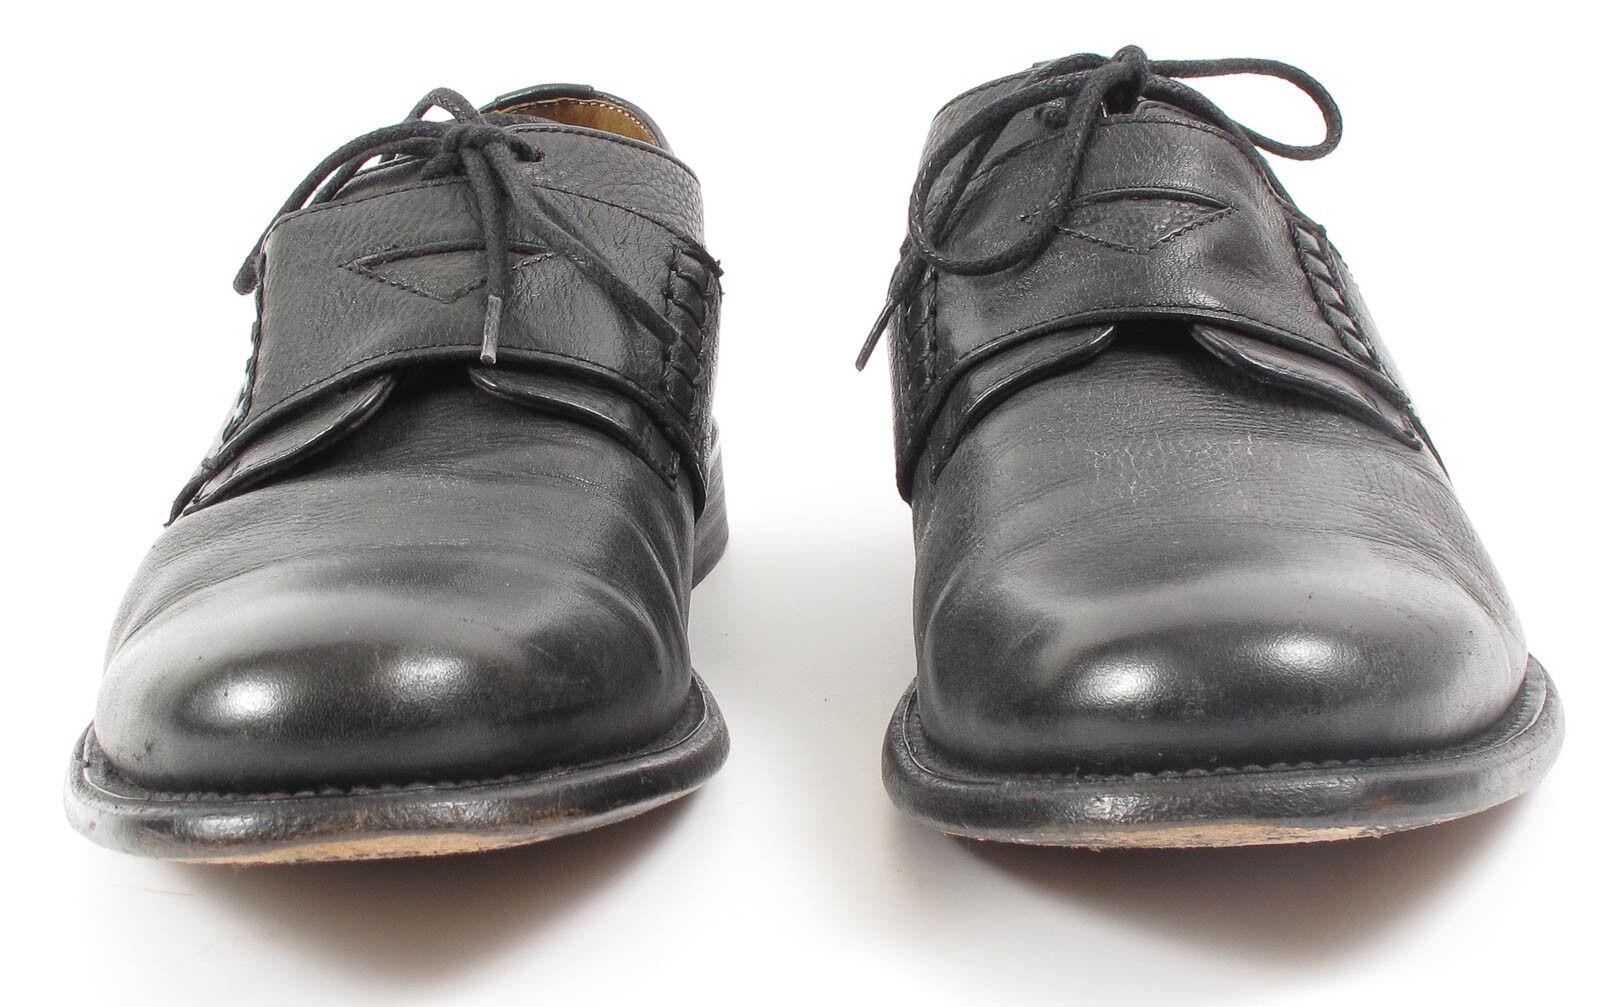 J. D. Fisk Schwarzes Leder Oxford Schuh Formelle Schuhe Größe Größe Größe 9 682766